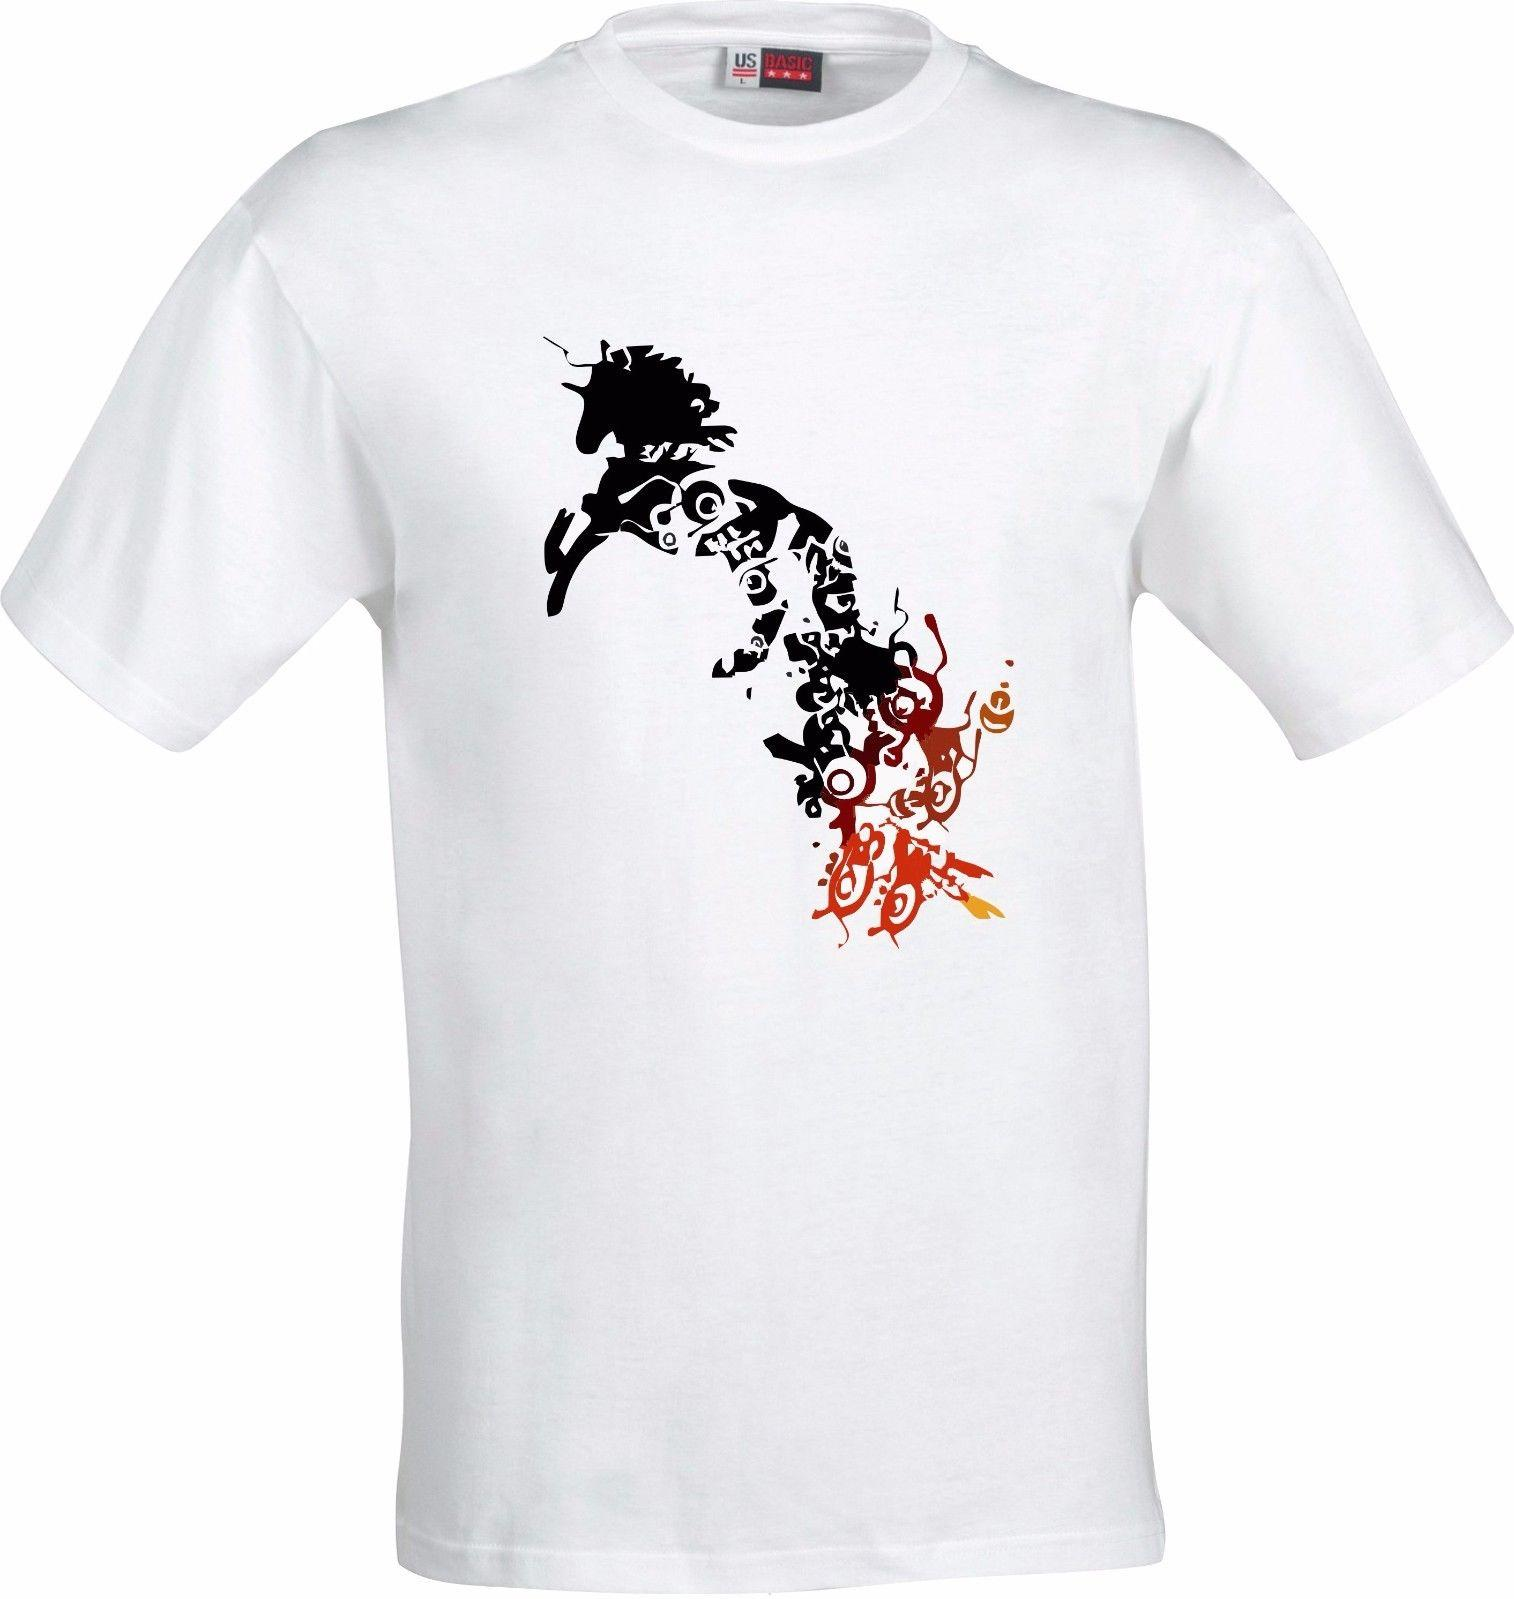 URBAN GRAFFITI UNICORN CHRISTMAS GIFT BIRTHDAY FULL COLOR SUBLIMATION T SHIRT Slogan Shirts Vintage Shirt From Xm24tshirt 1205